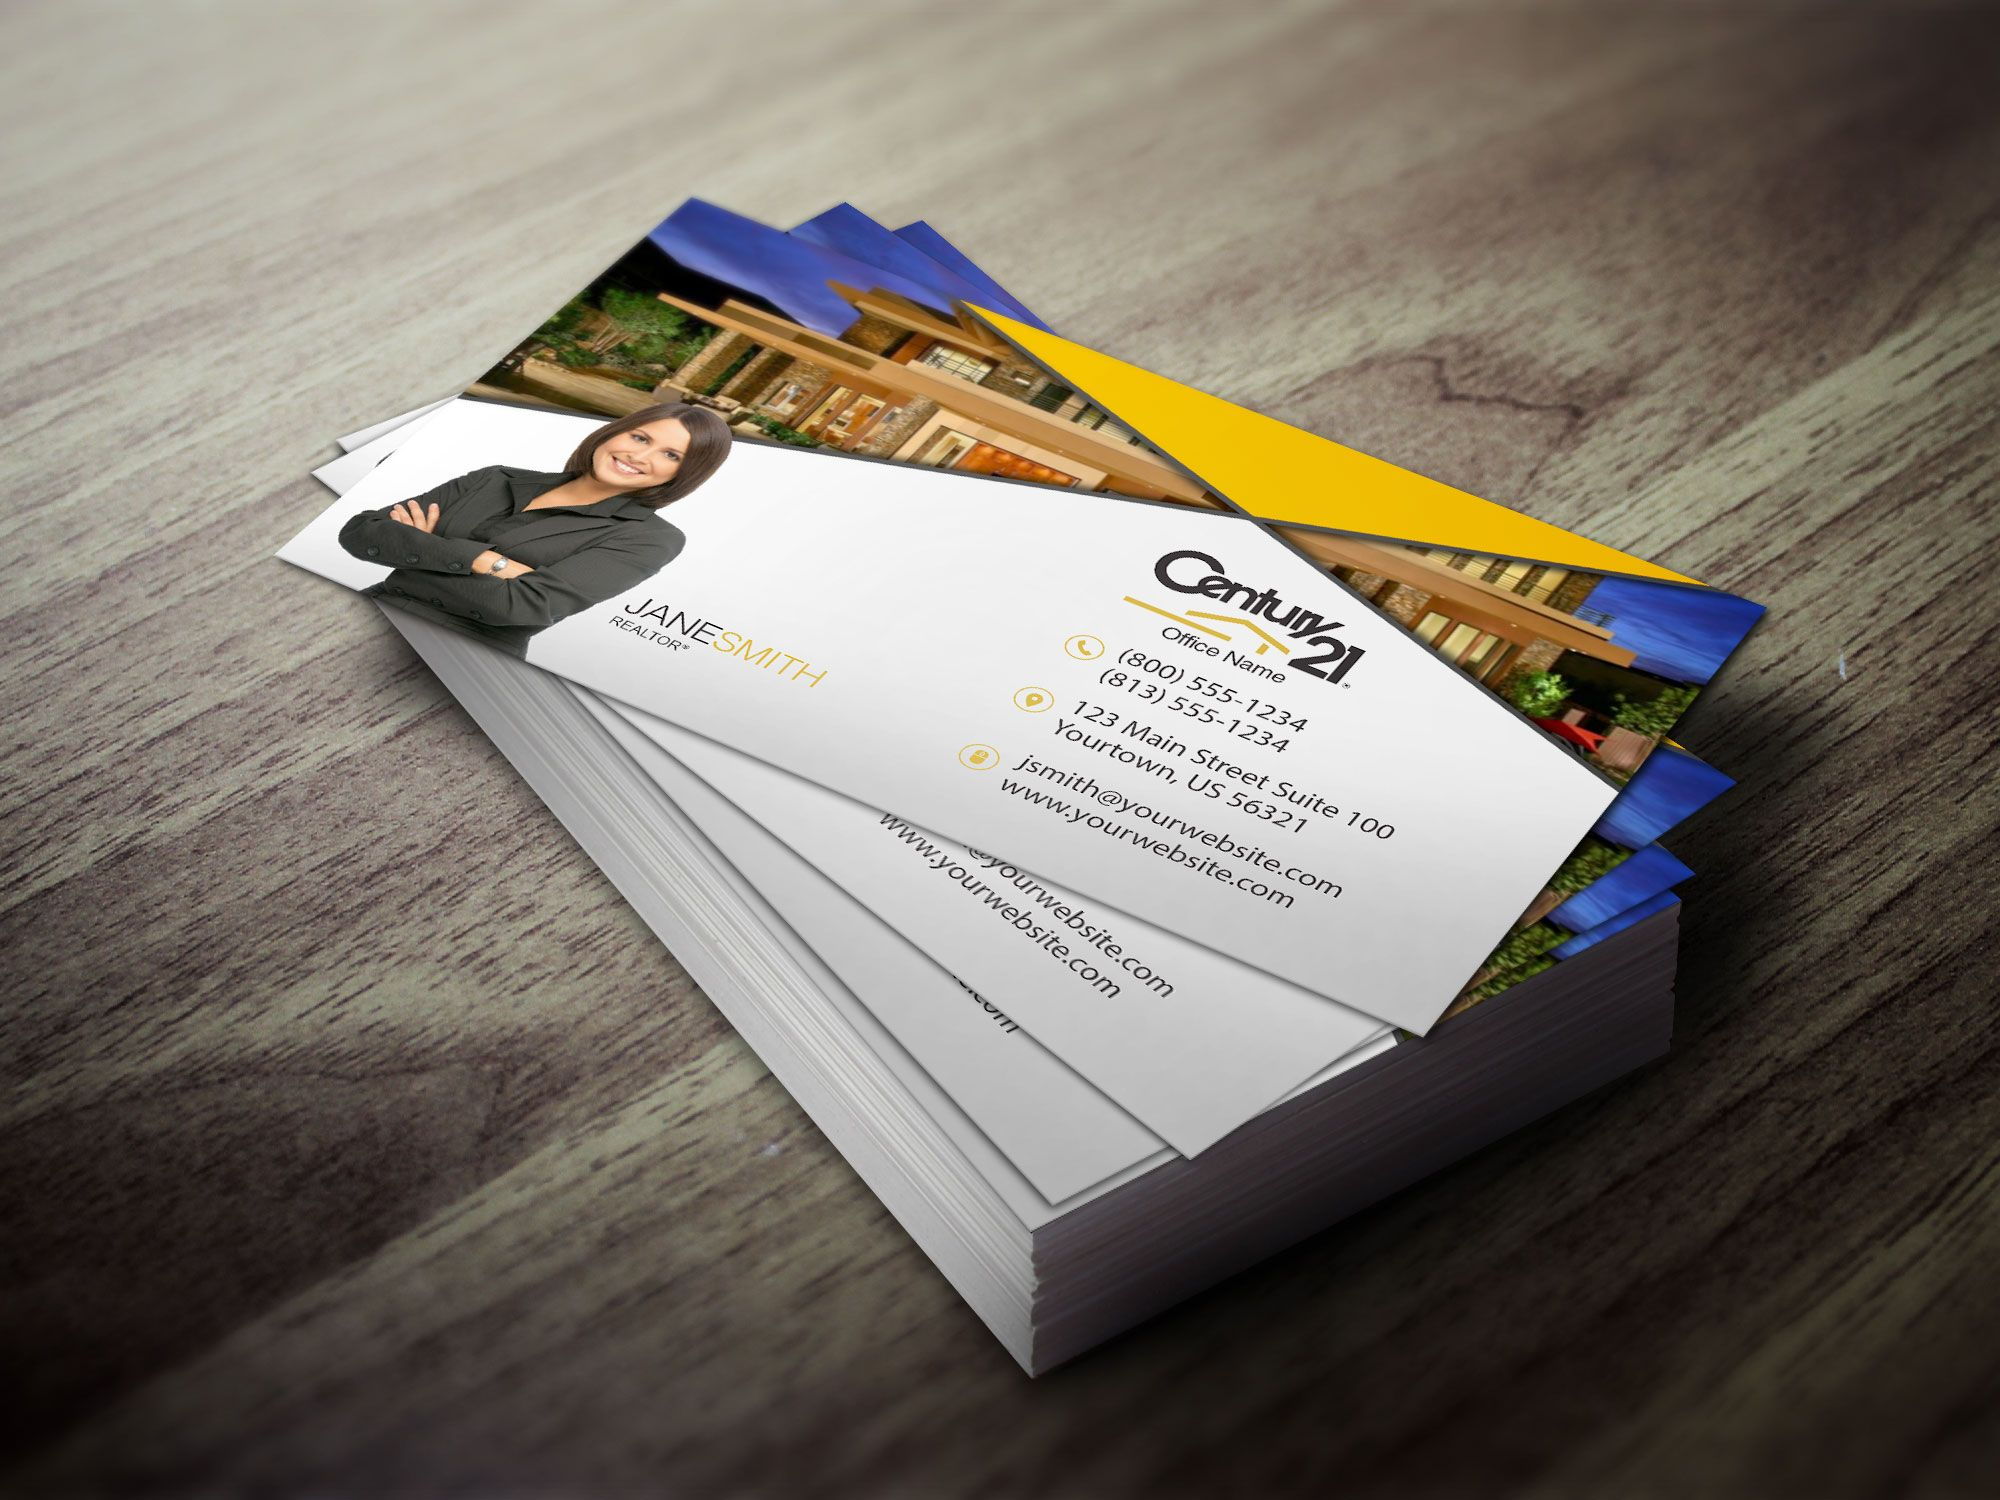 Clean business card design for Century 21 | 2017 Century 21 Designs ...